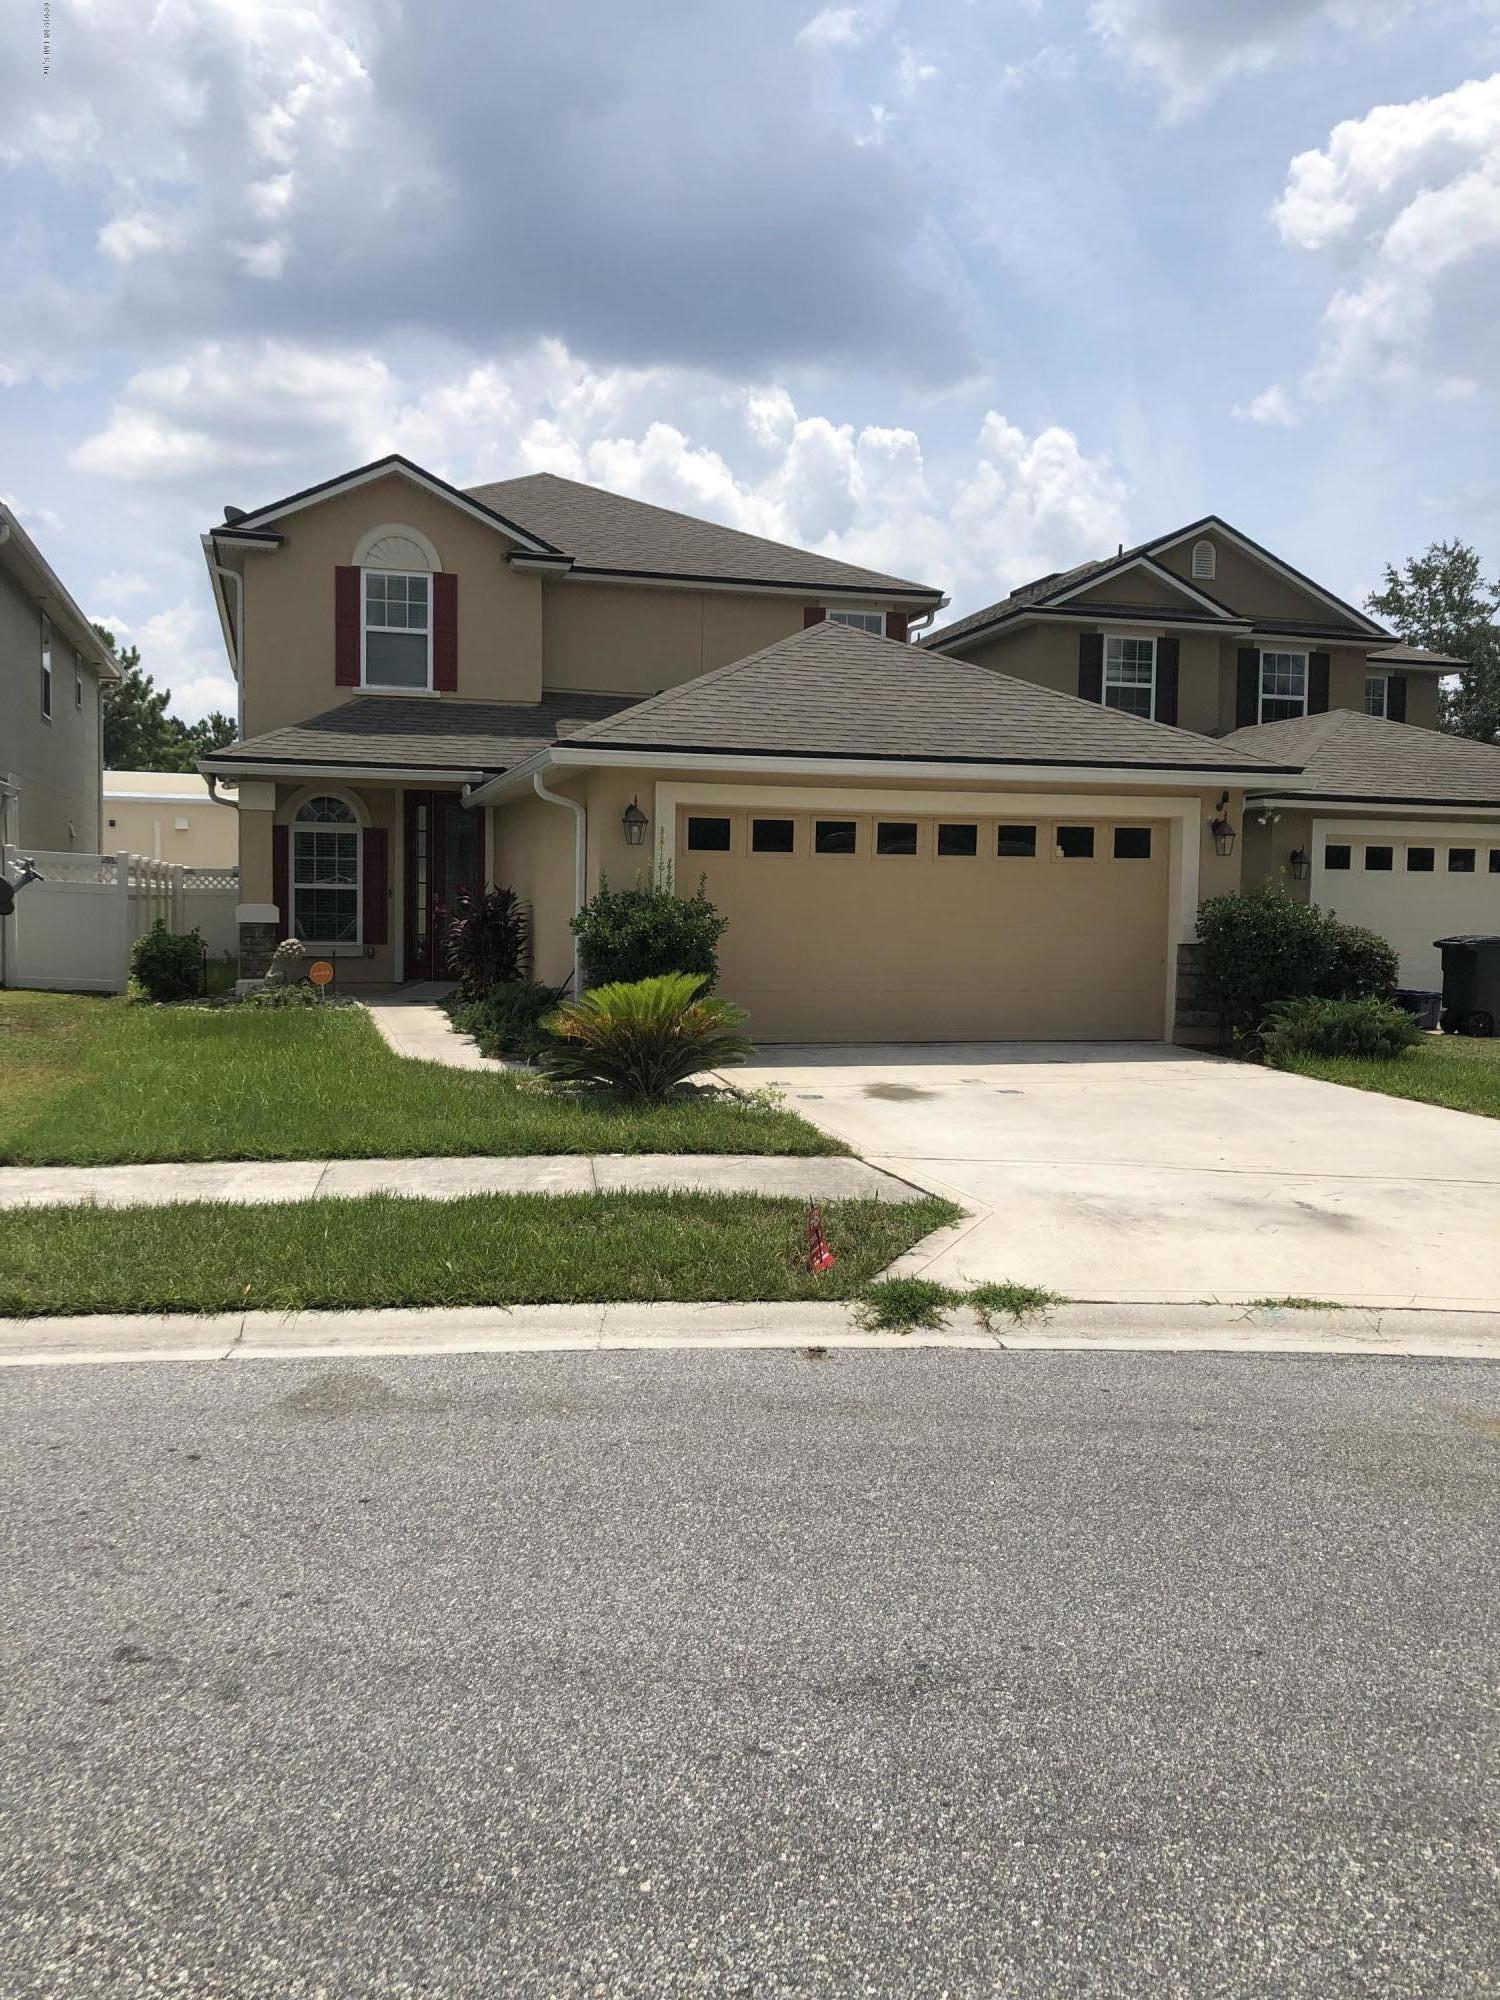 444 MAHONEY, ORANGE PARK, FLORIDA 32065, 4 Bedrooms Bedrooms, ,3 BathroomsBathrooms,Residential - single family,For sale,MAHONEY,1010374